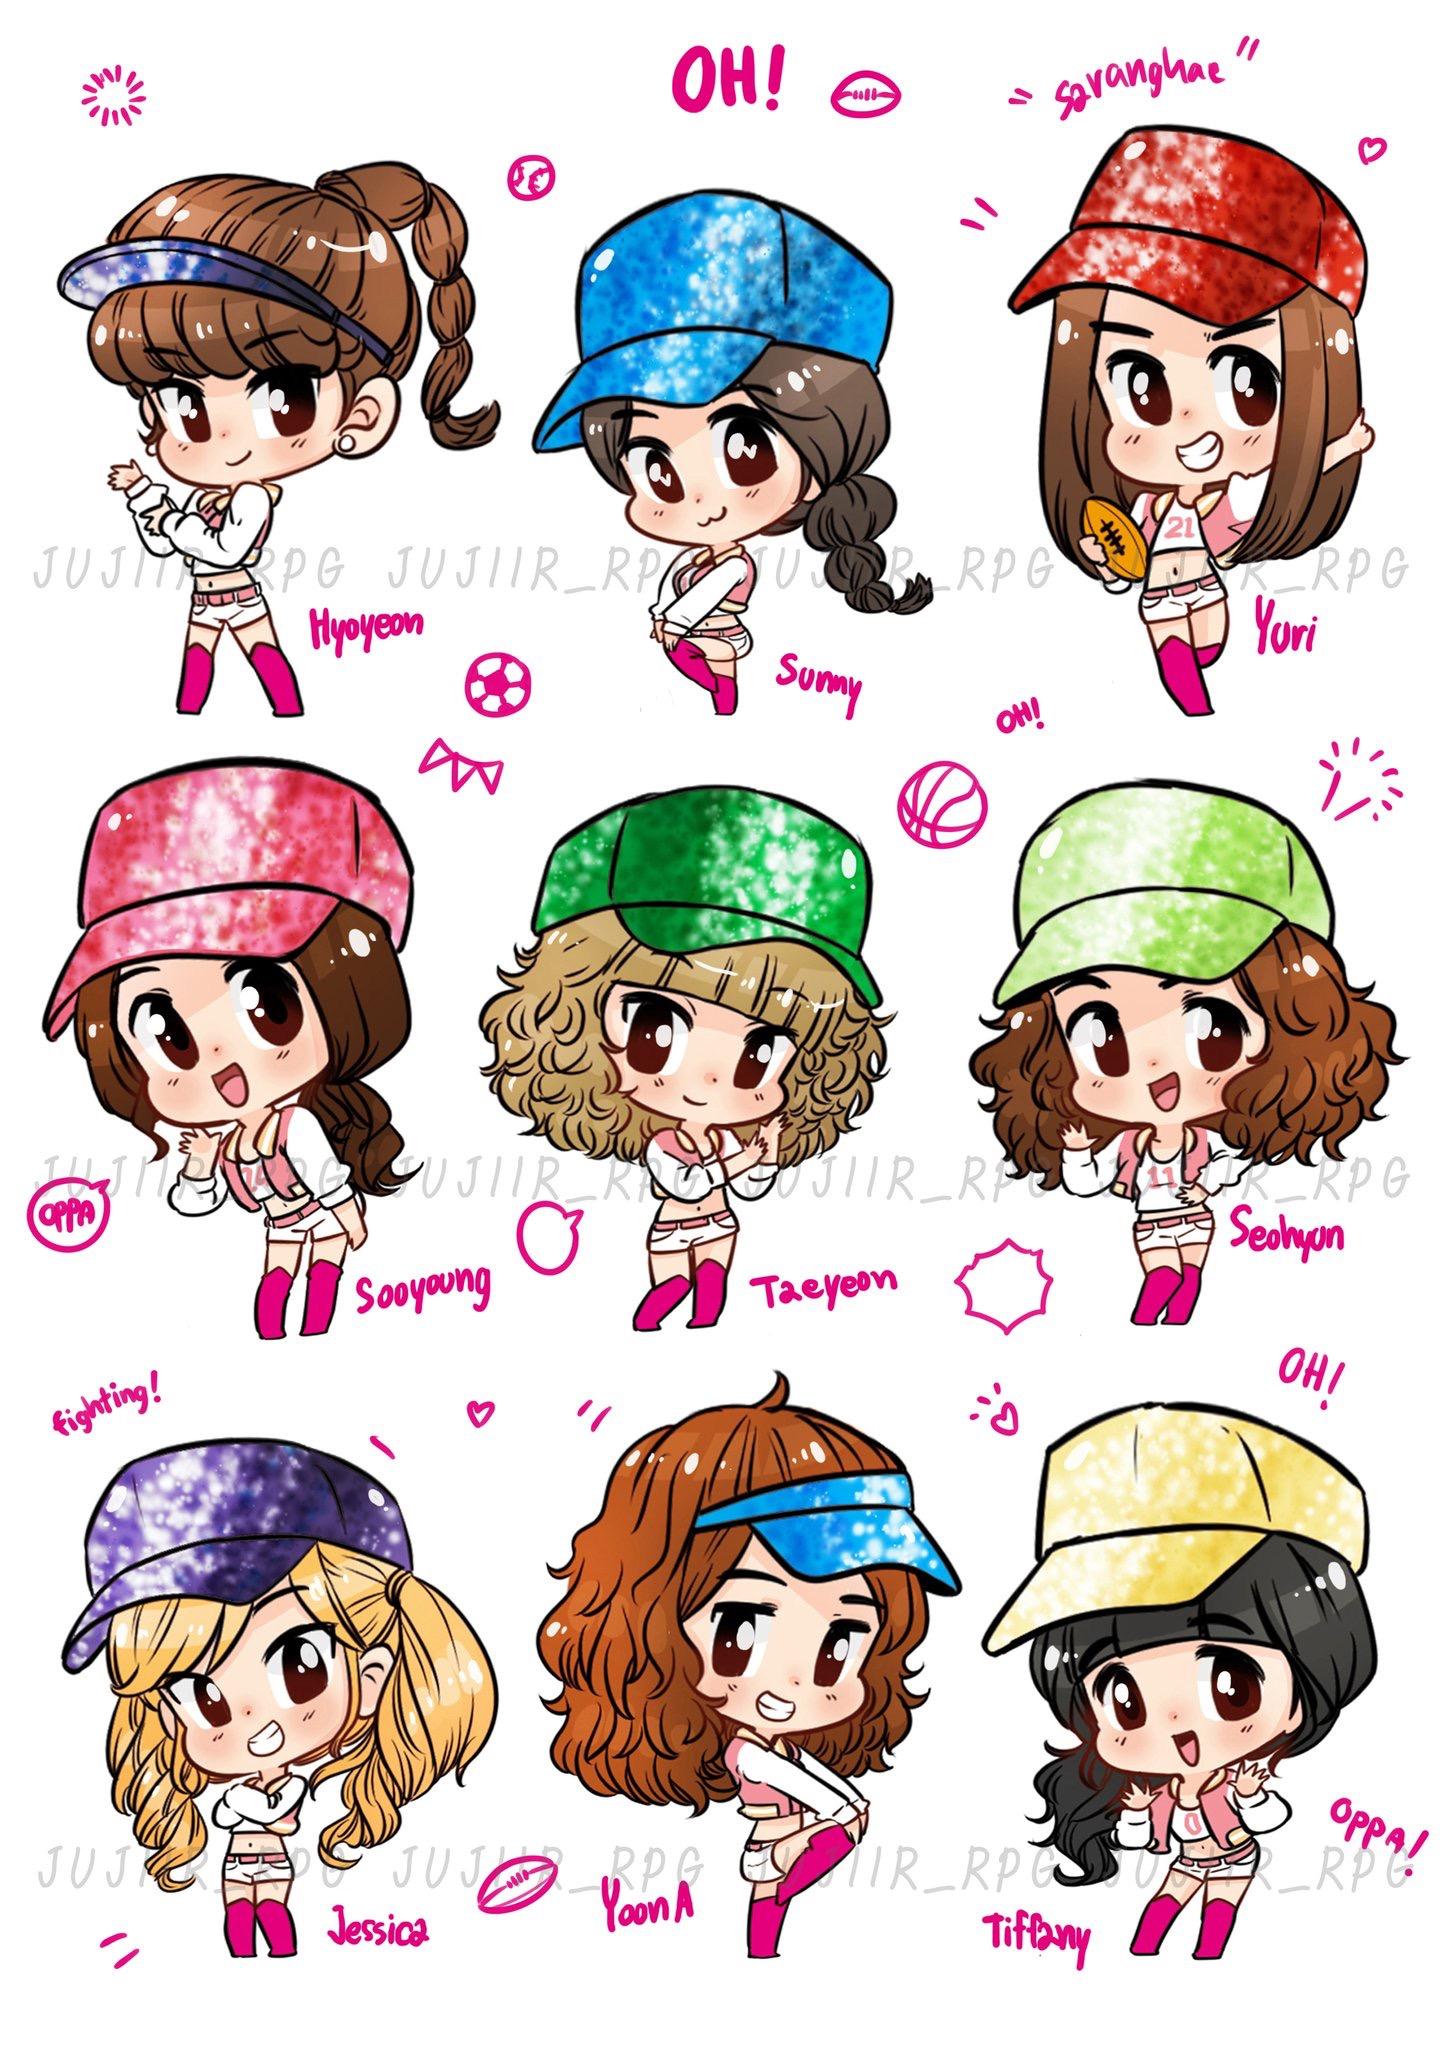 Kpop Girl Groups, Kpop Girls, Snsd Tiffa-Kpop Girl Groups, Kpop Girls, Snsd Tiffany, Girls Generation, Chibi,  Fanart, Skottie Young, 10 Anniversary, Sooyoung-14